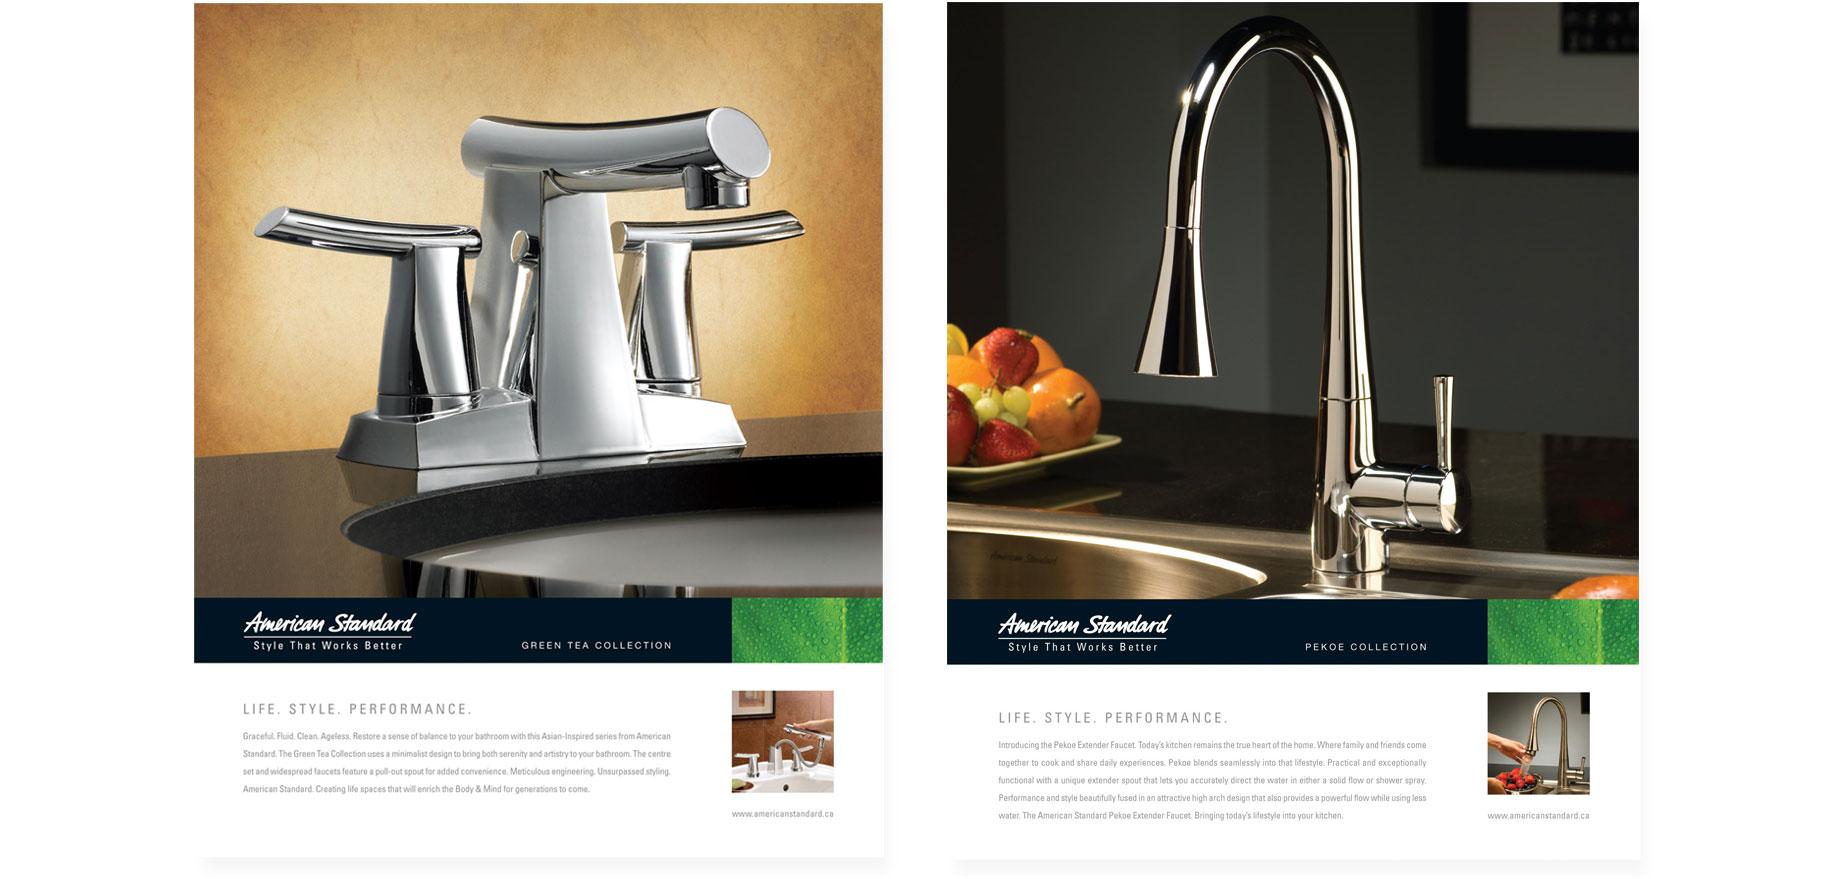 bradshaw design passionate engaged and prone to exceeding american standard work protfolio slide